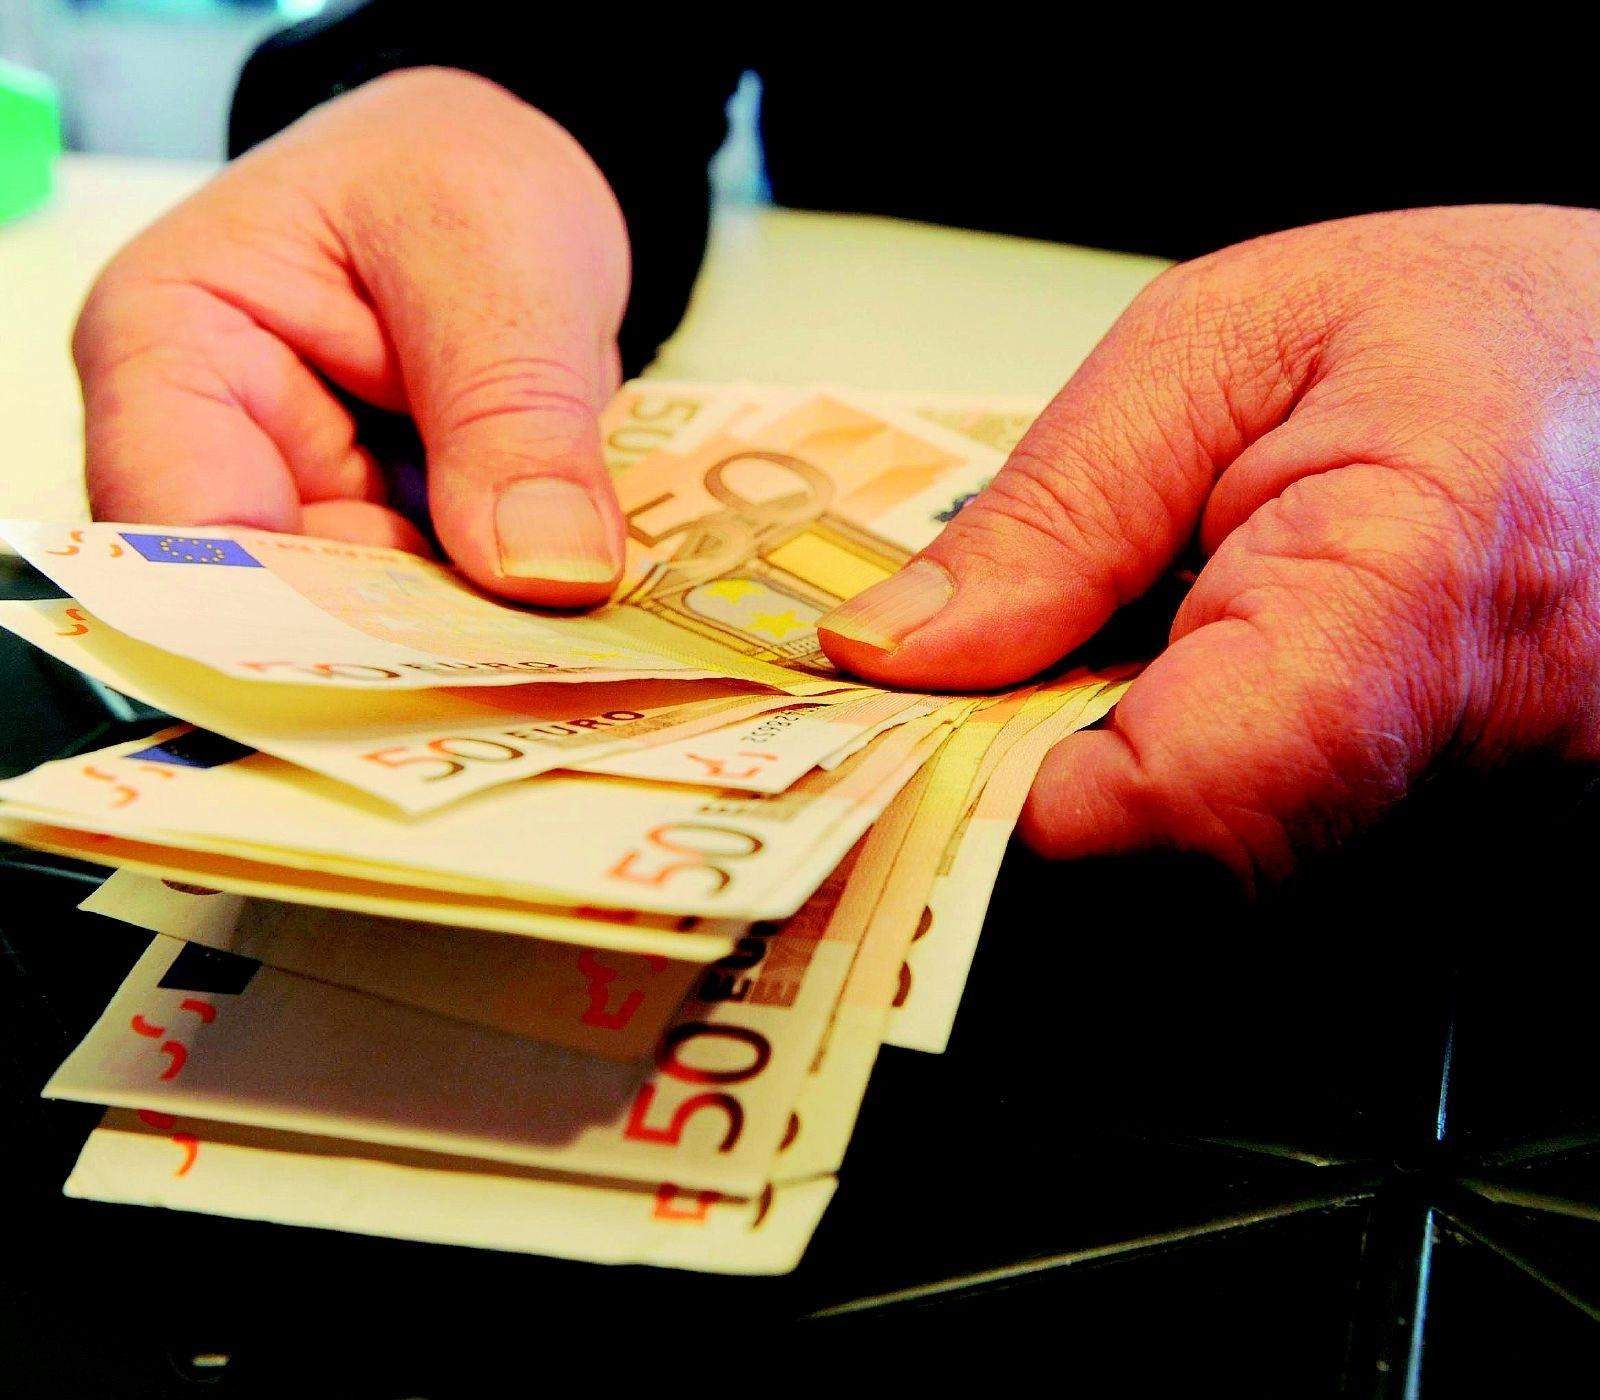 Forlì, 13enne macedone trova 170 euro a terra e li consegna alla Municipale